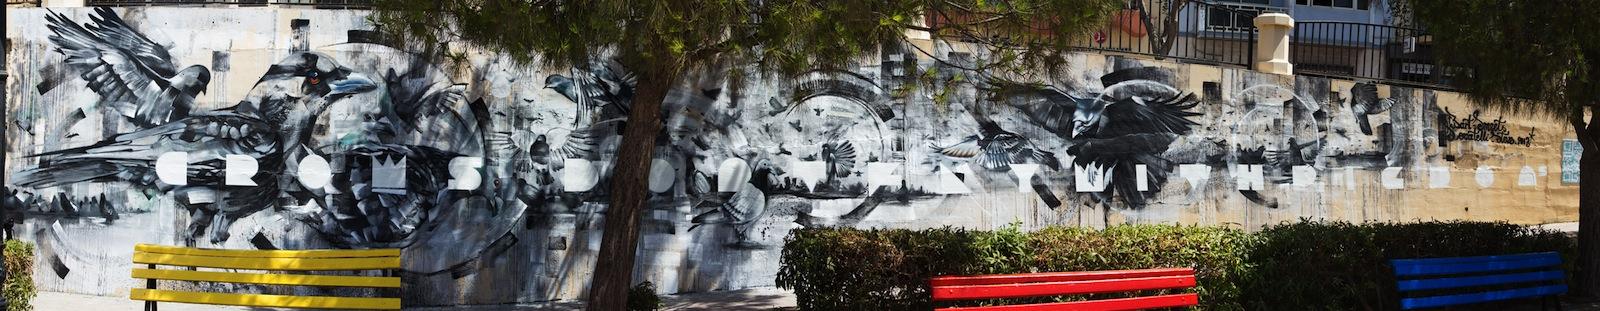 By Steve Locatelli and Smates at the Sliema Street Art Festival. Photo by Asperholm Productions in Sliema, Malta 2